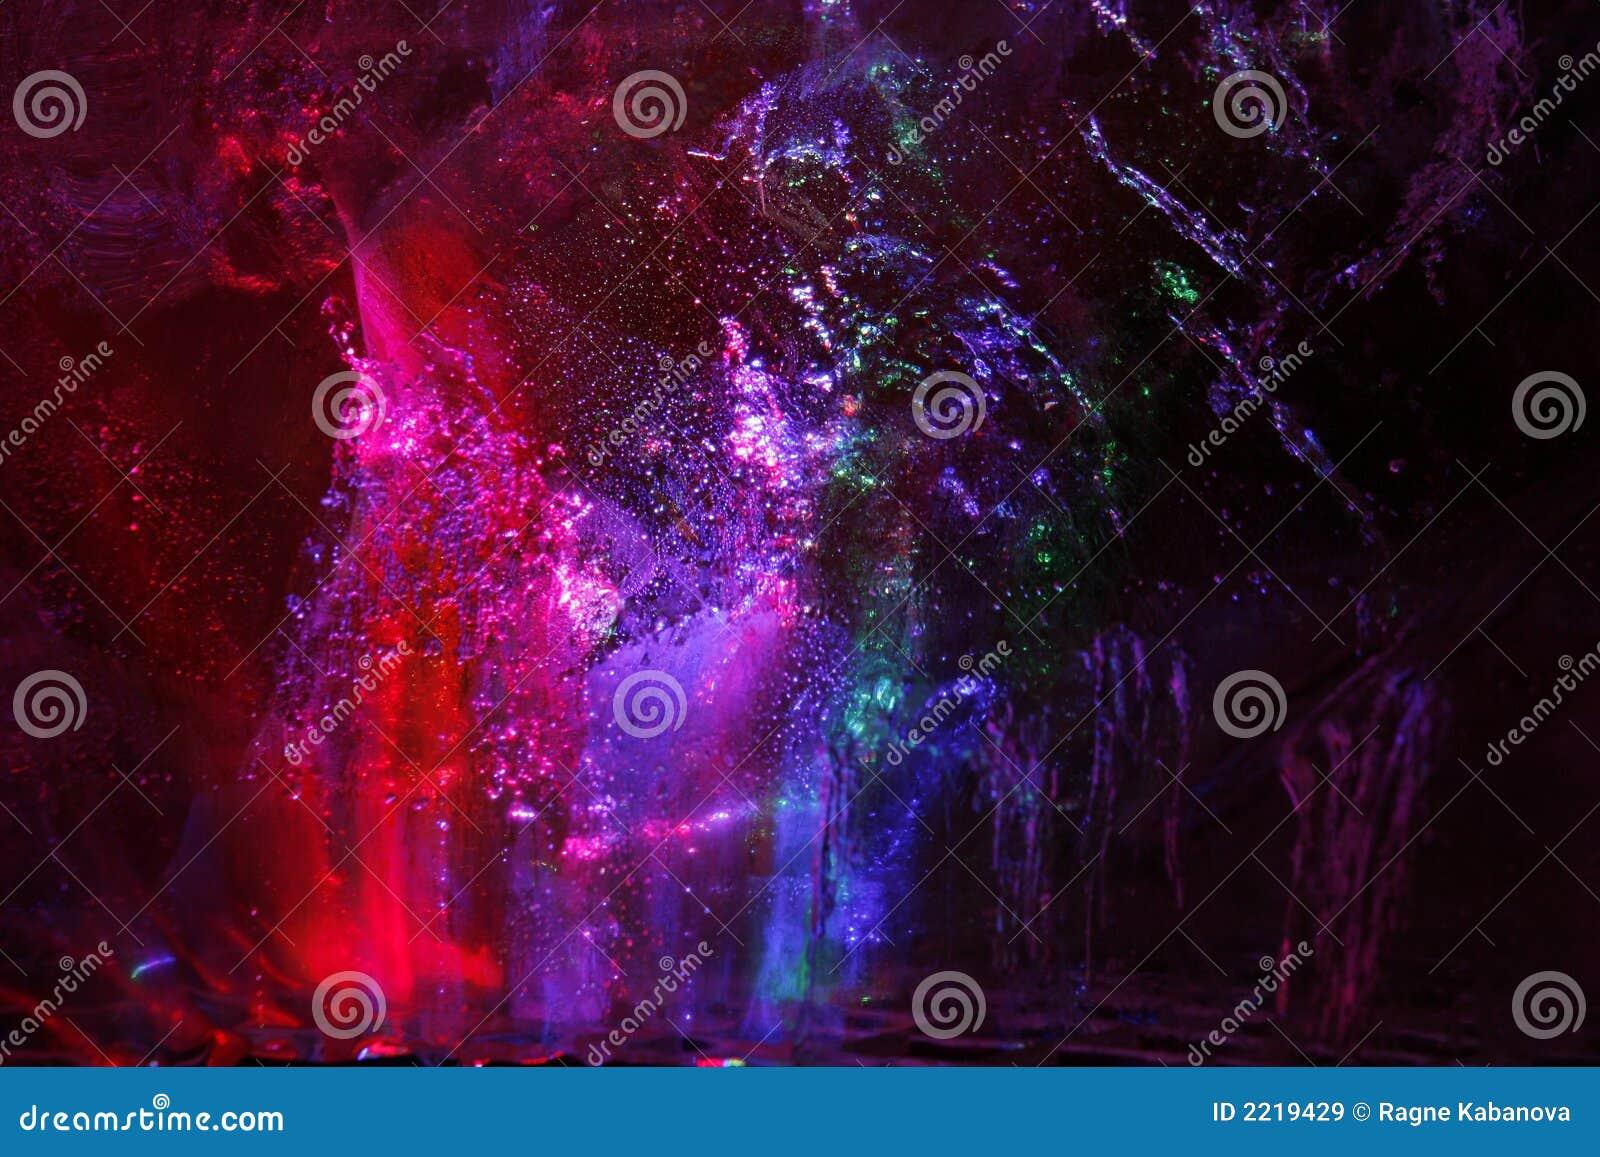 Farbige eisige Oberfläche